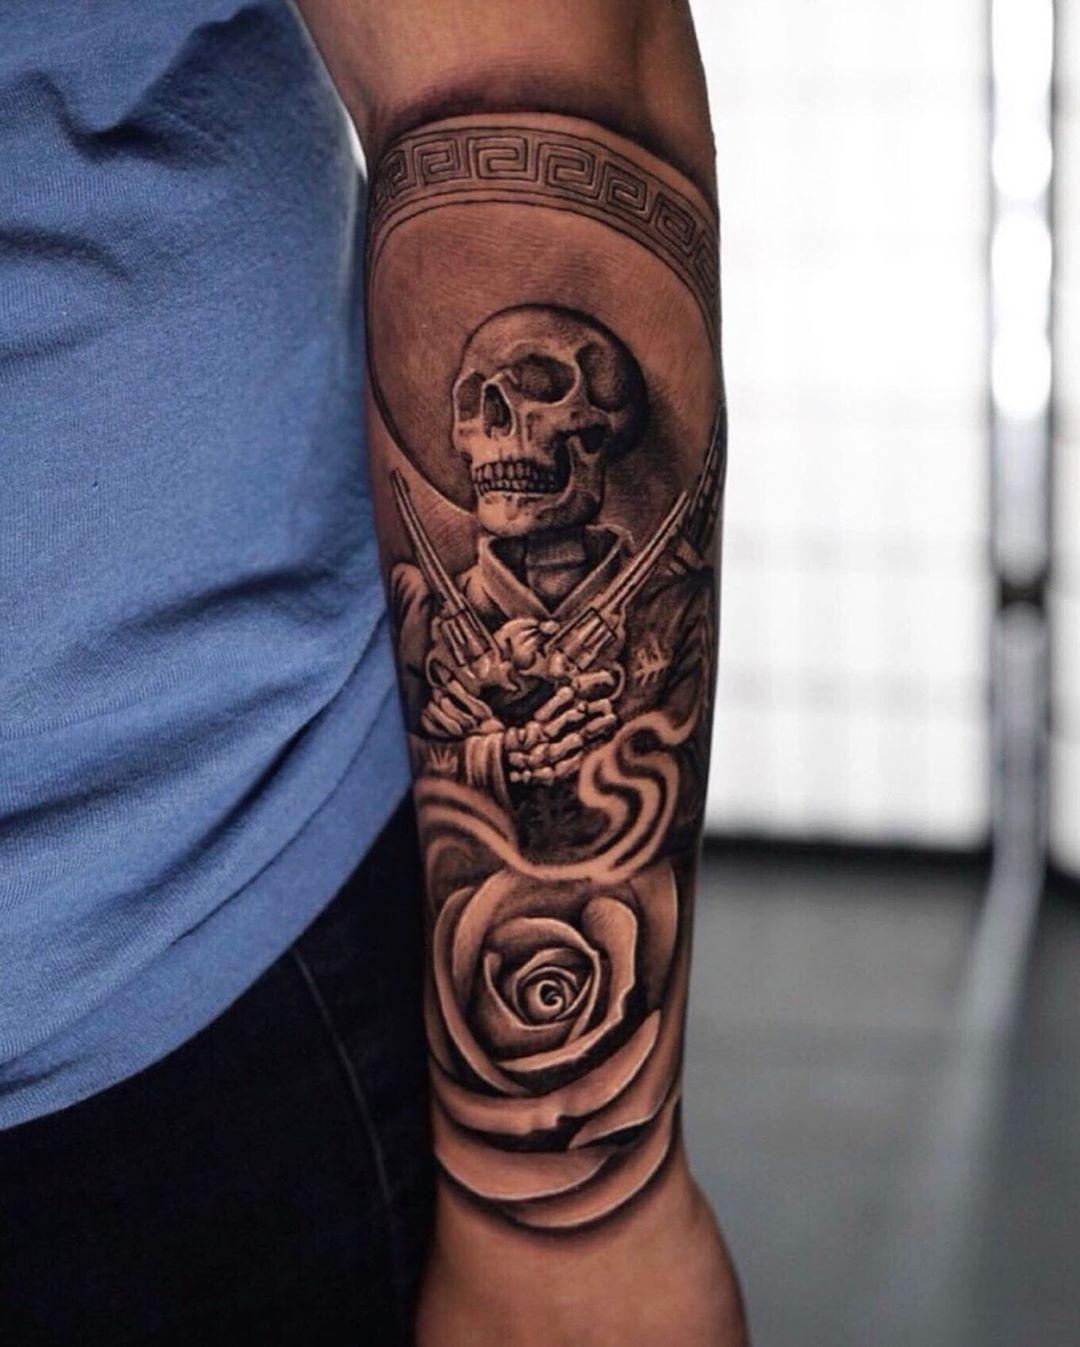 Tattoos Aztec Tattoo Aztec Tattoos Sleeve Chicano Tattoos Sleeve